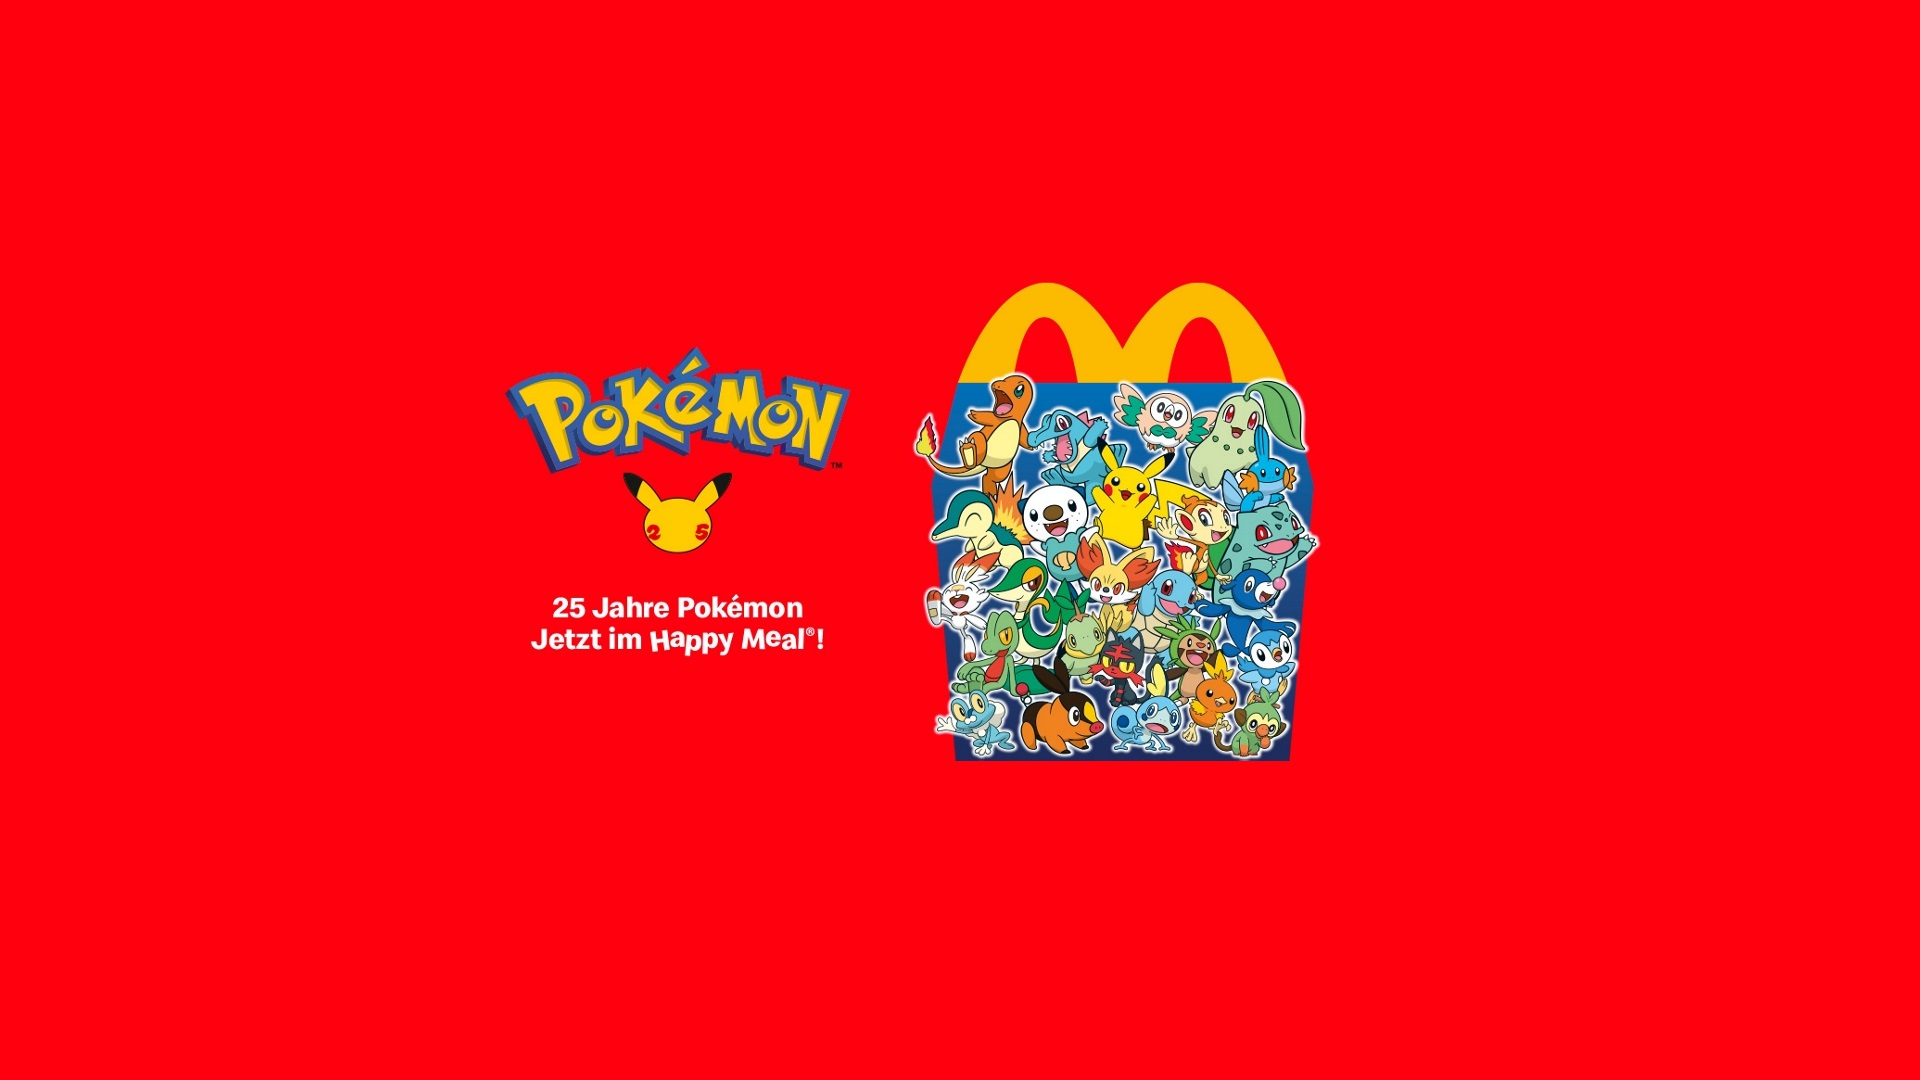 Pokémon: McDonalds now has exclusive trading cards